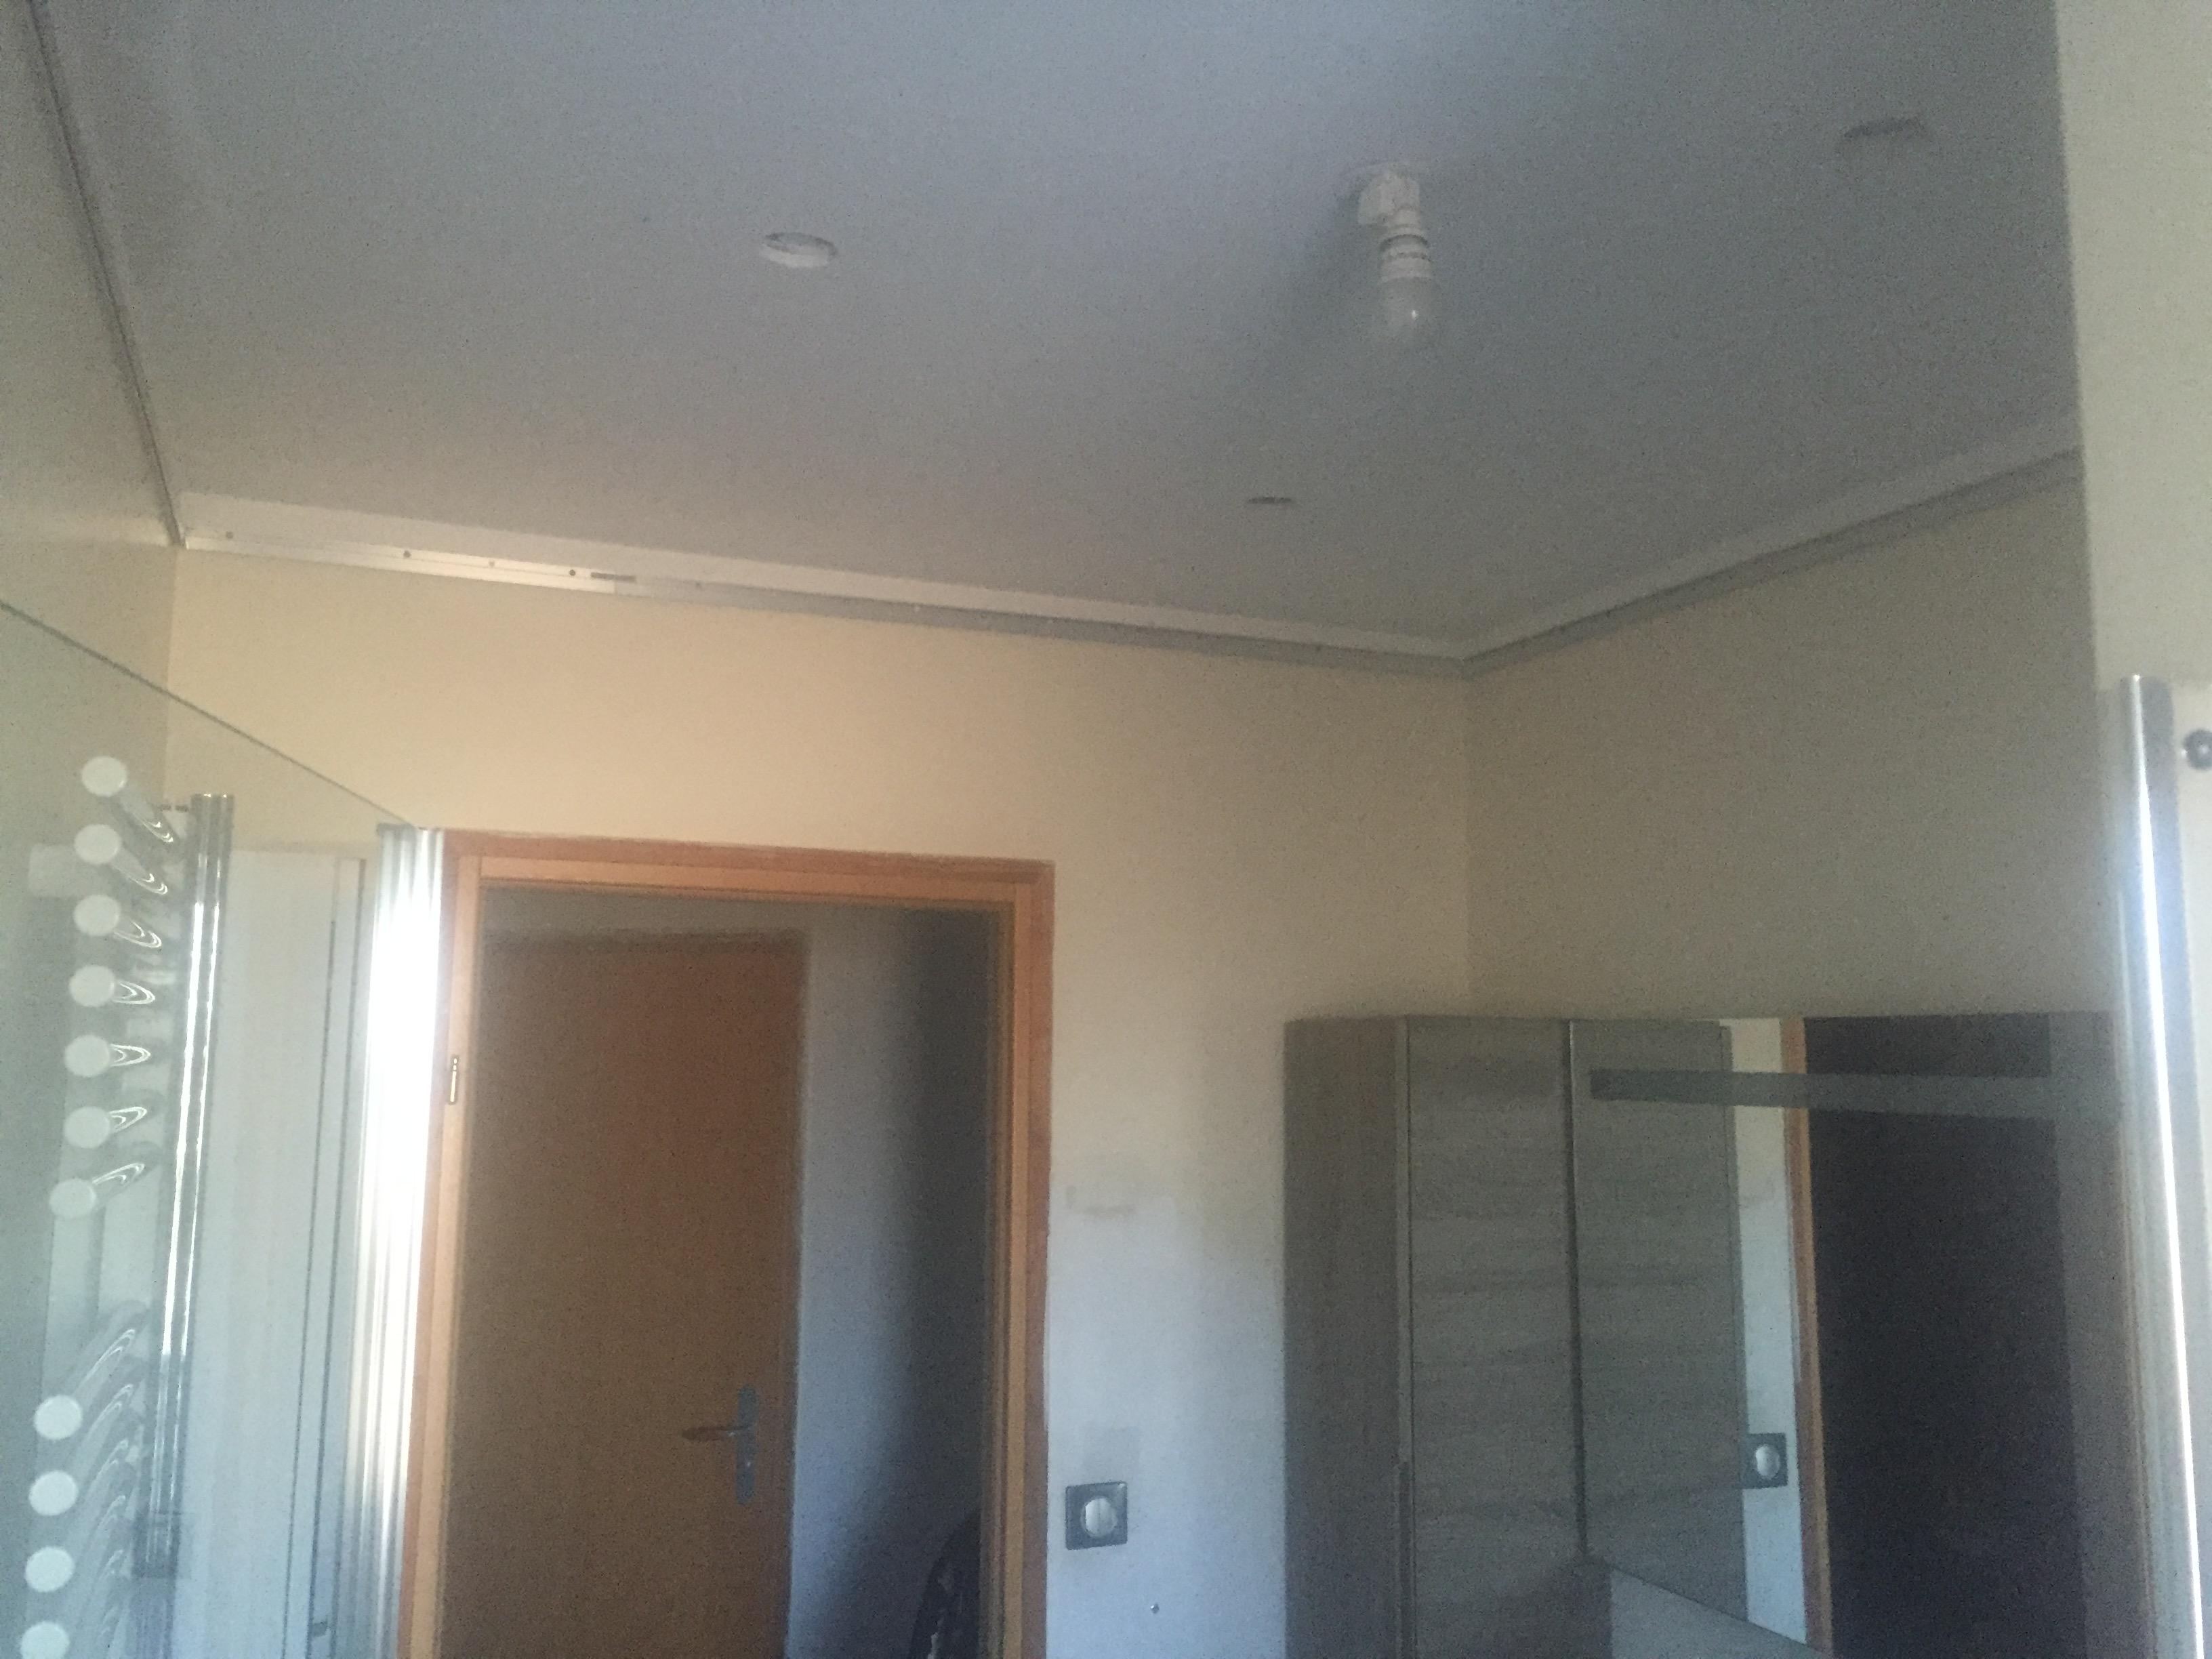 Plafond tendu laque taupe azaret steve robert peinture for Plafond toile tendu